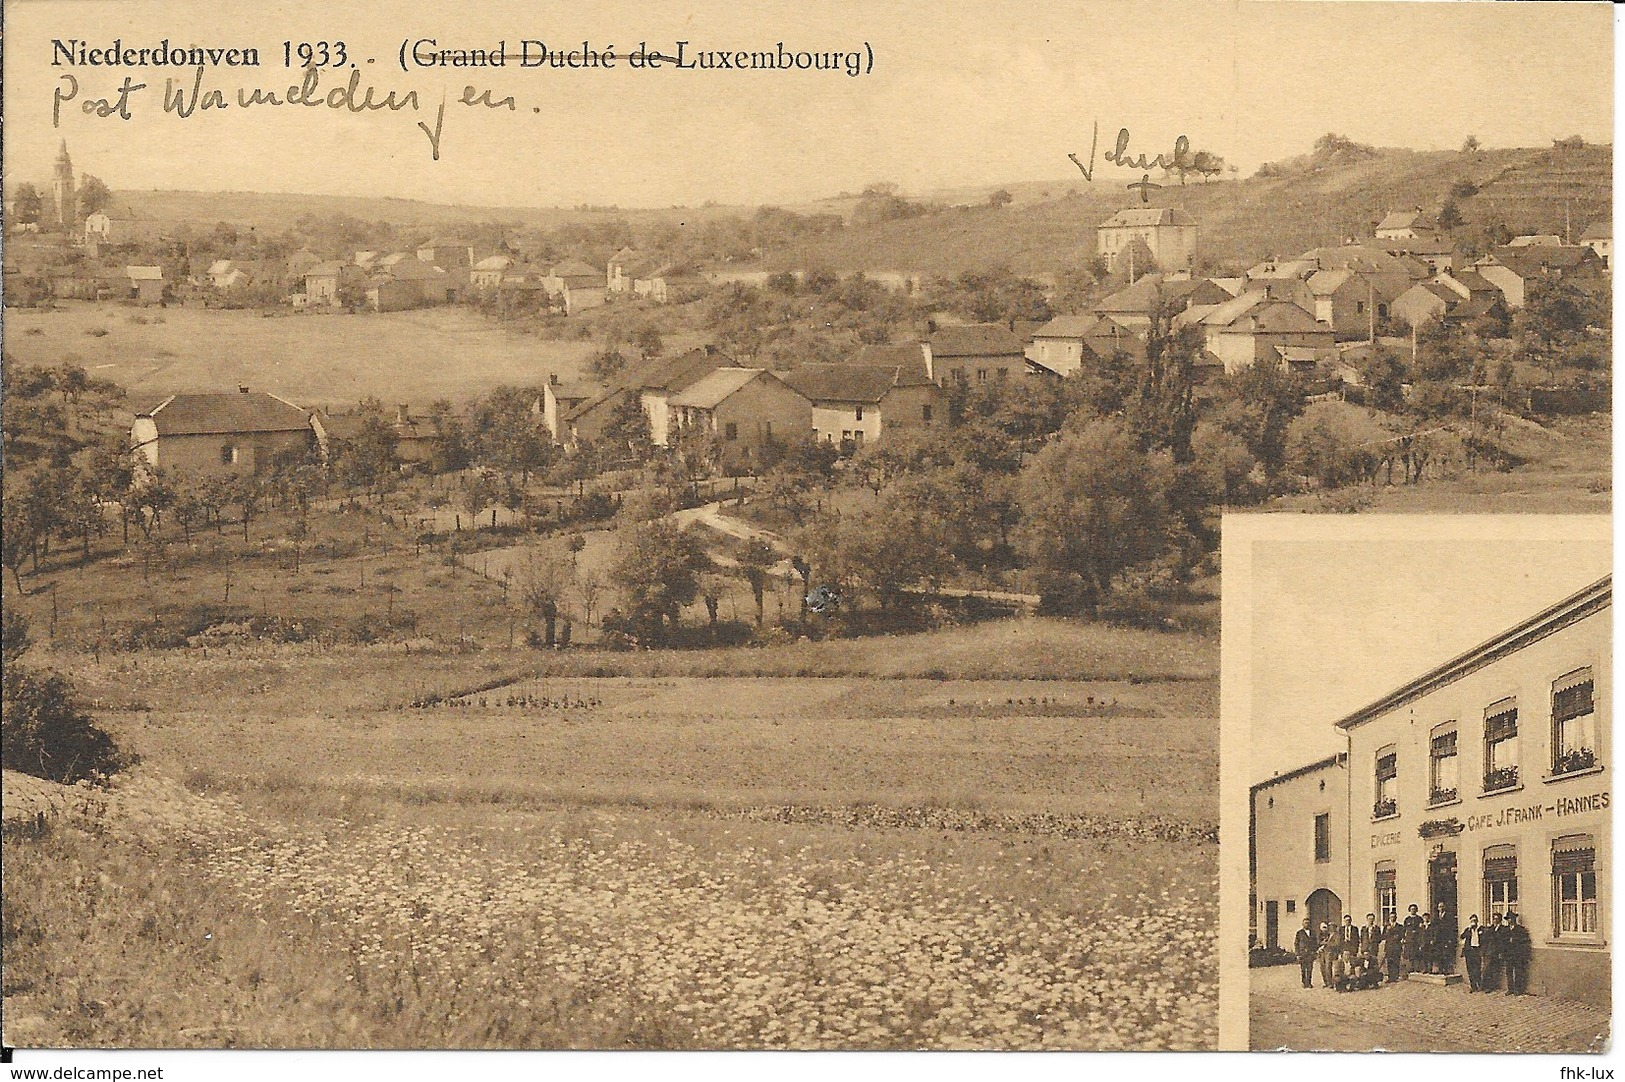 CARTE POSTALE ANCIENNE  NIEDERDONVEN  1933  - LUXEMBOURG - Cartes Postales